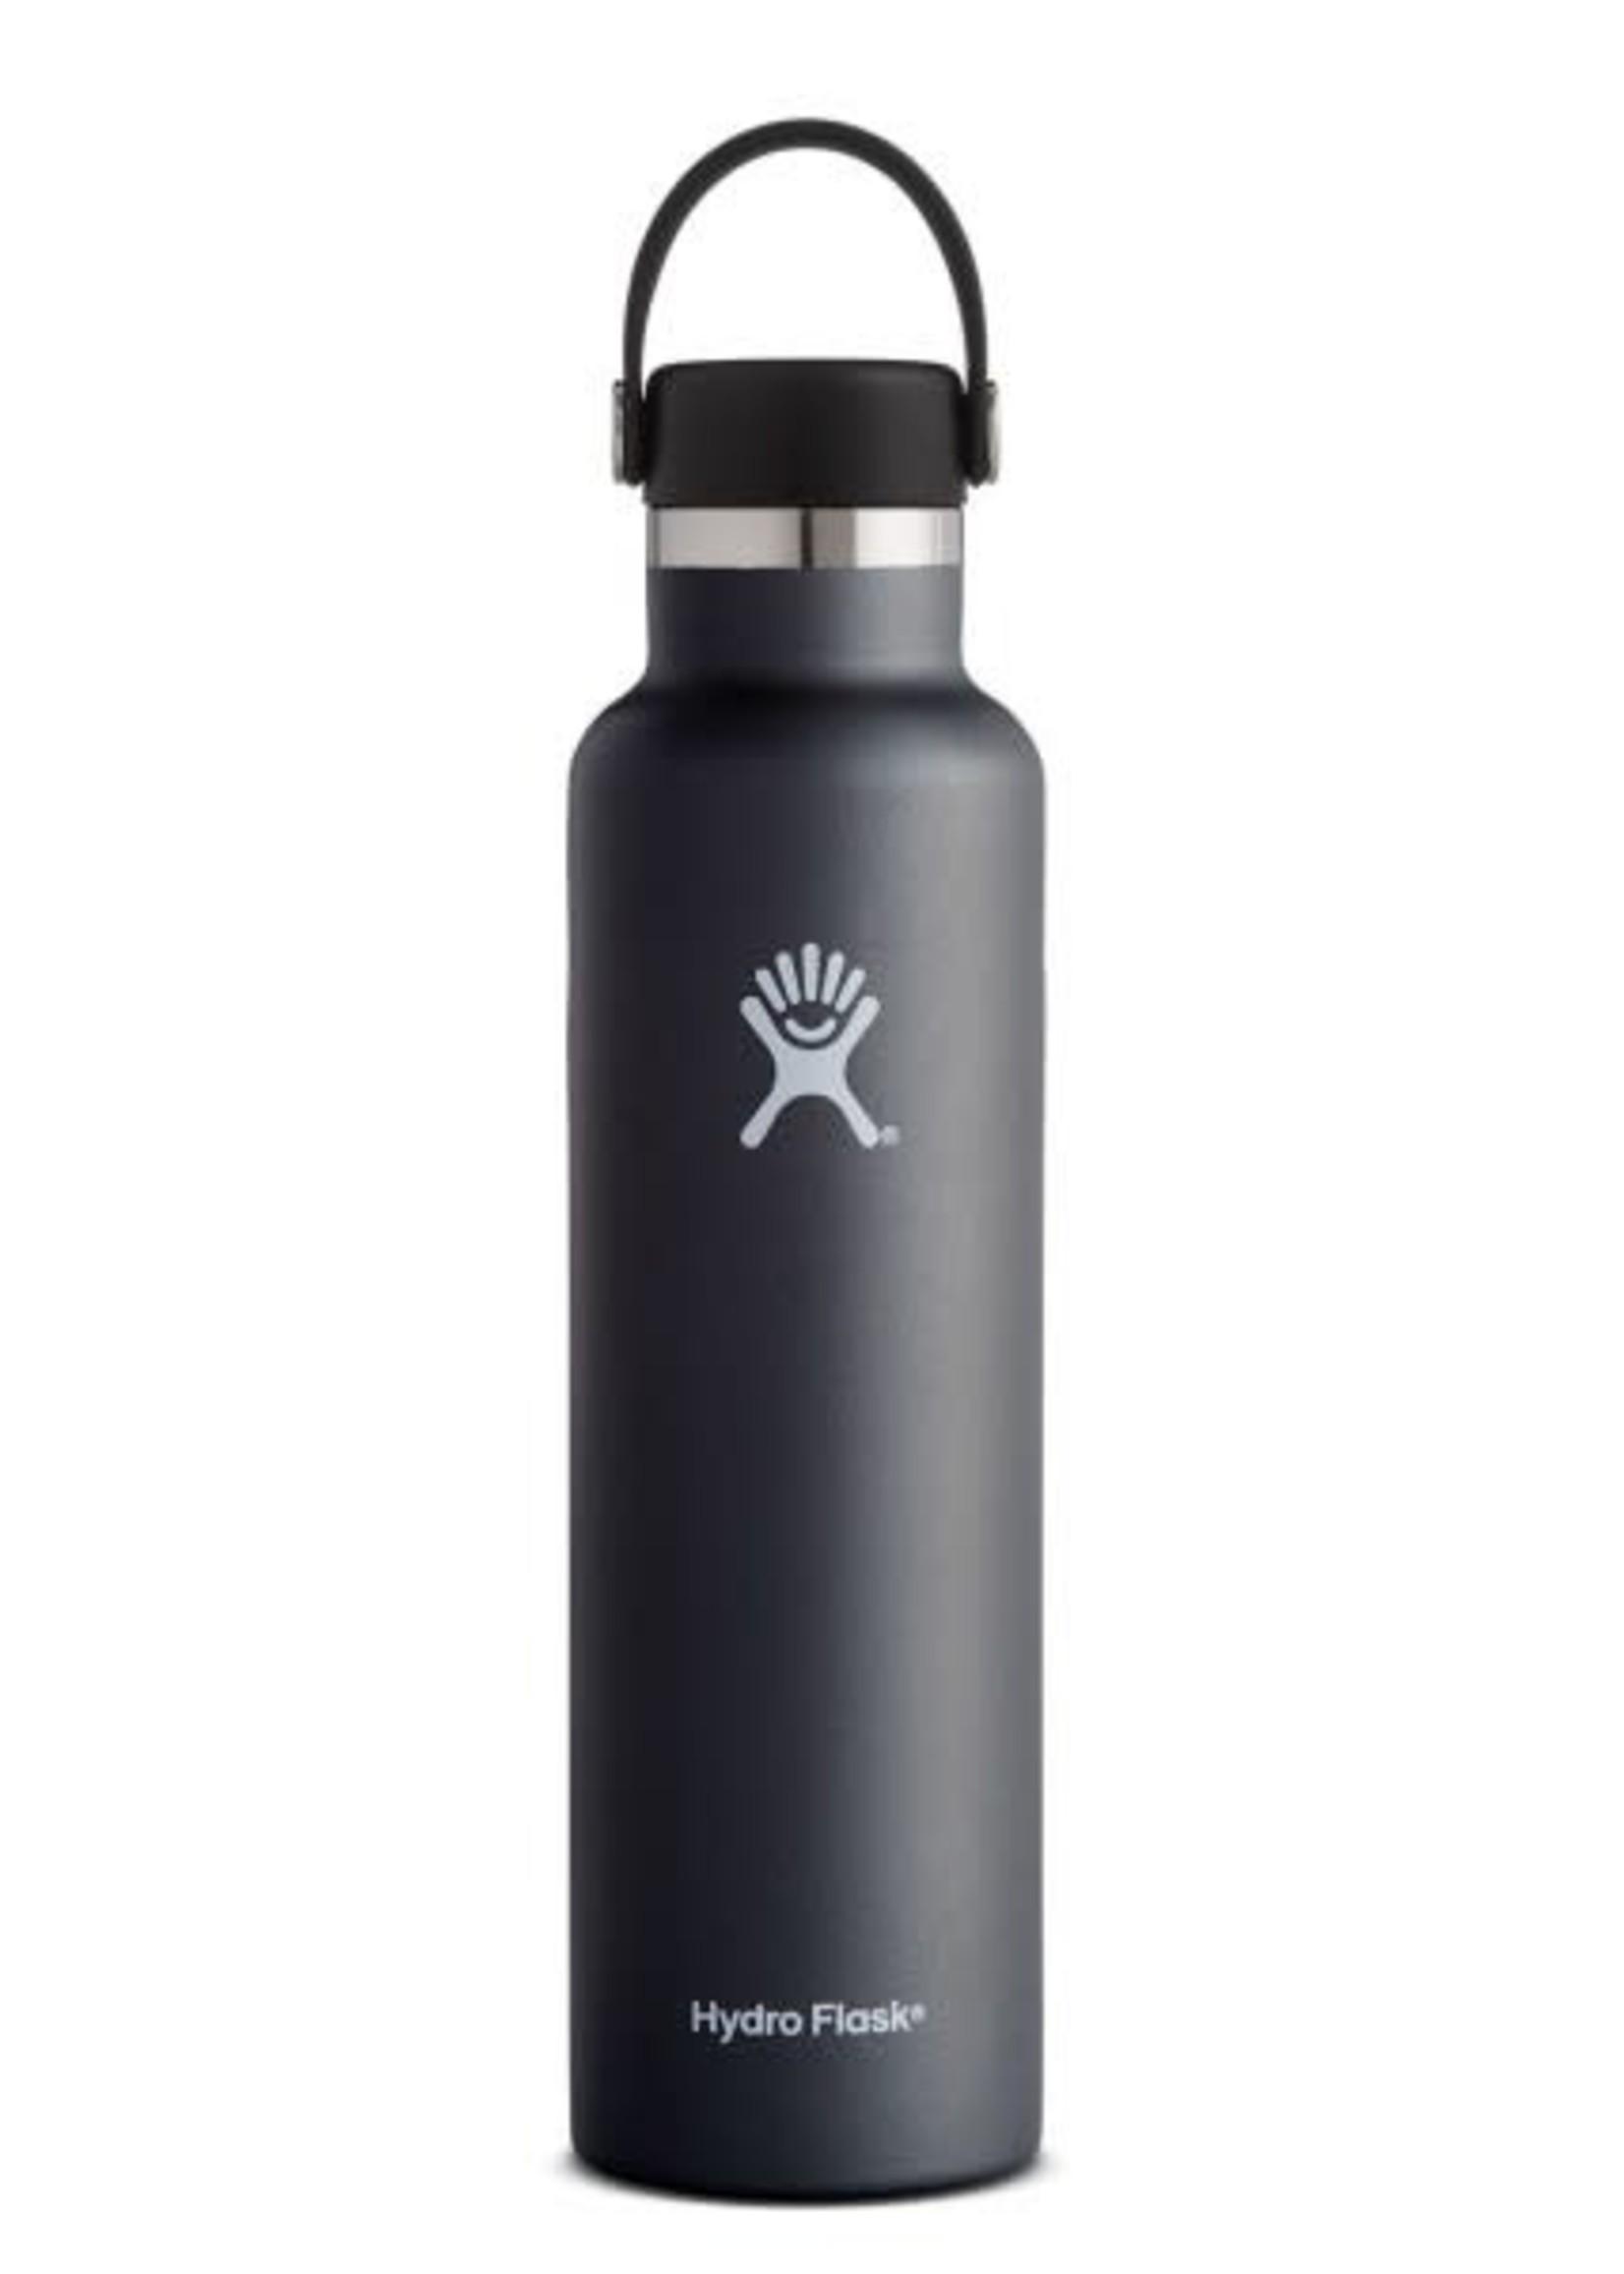 Hydro Flask Hydro Flask Standard Flex Blk Cap -